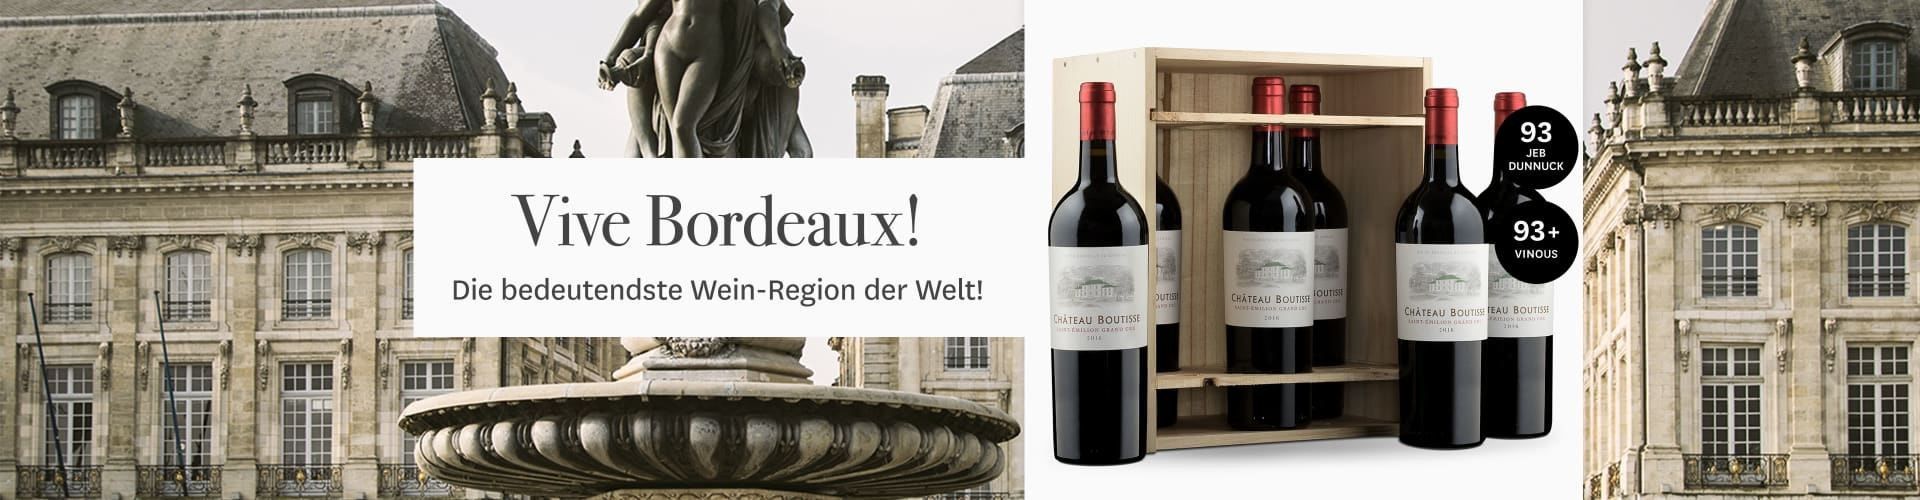 Bordeaux-Grand Cru in der Original-Holzkiste